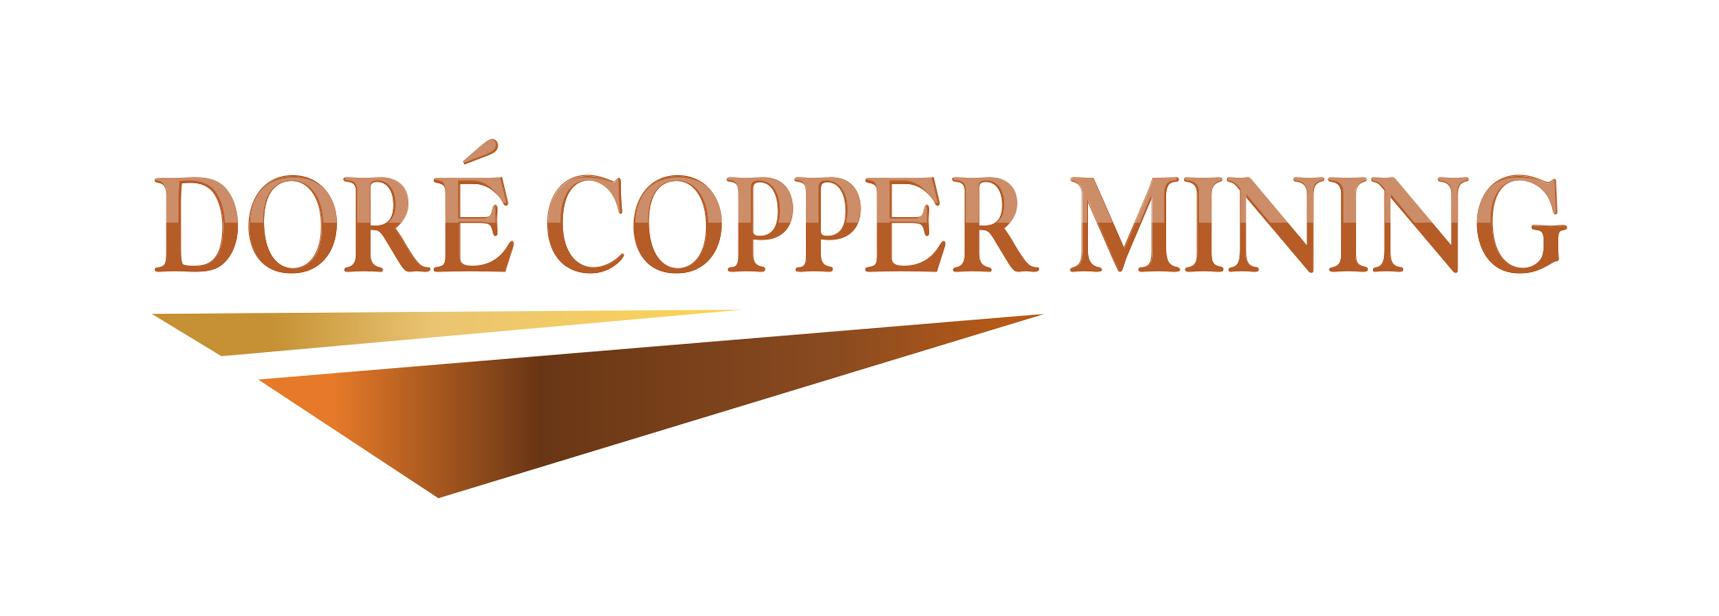 Doré Copper Announces up to C$5 Million Non-Brokered Private Placement